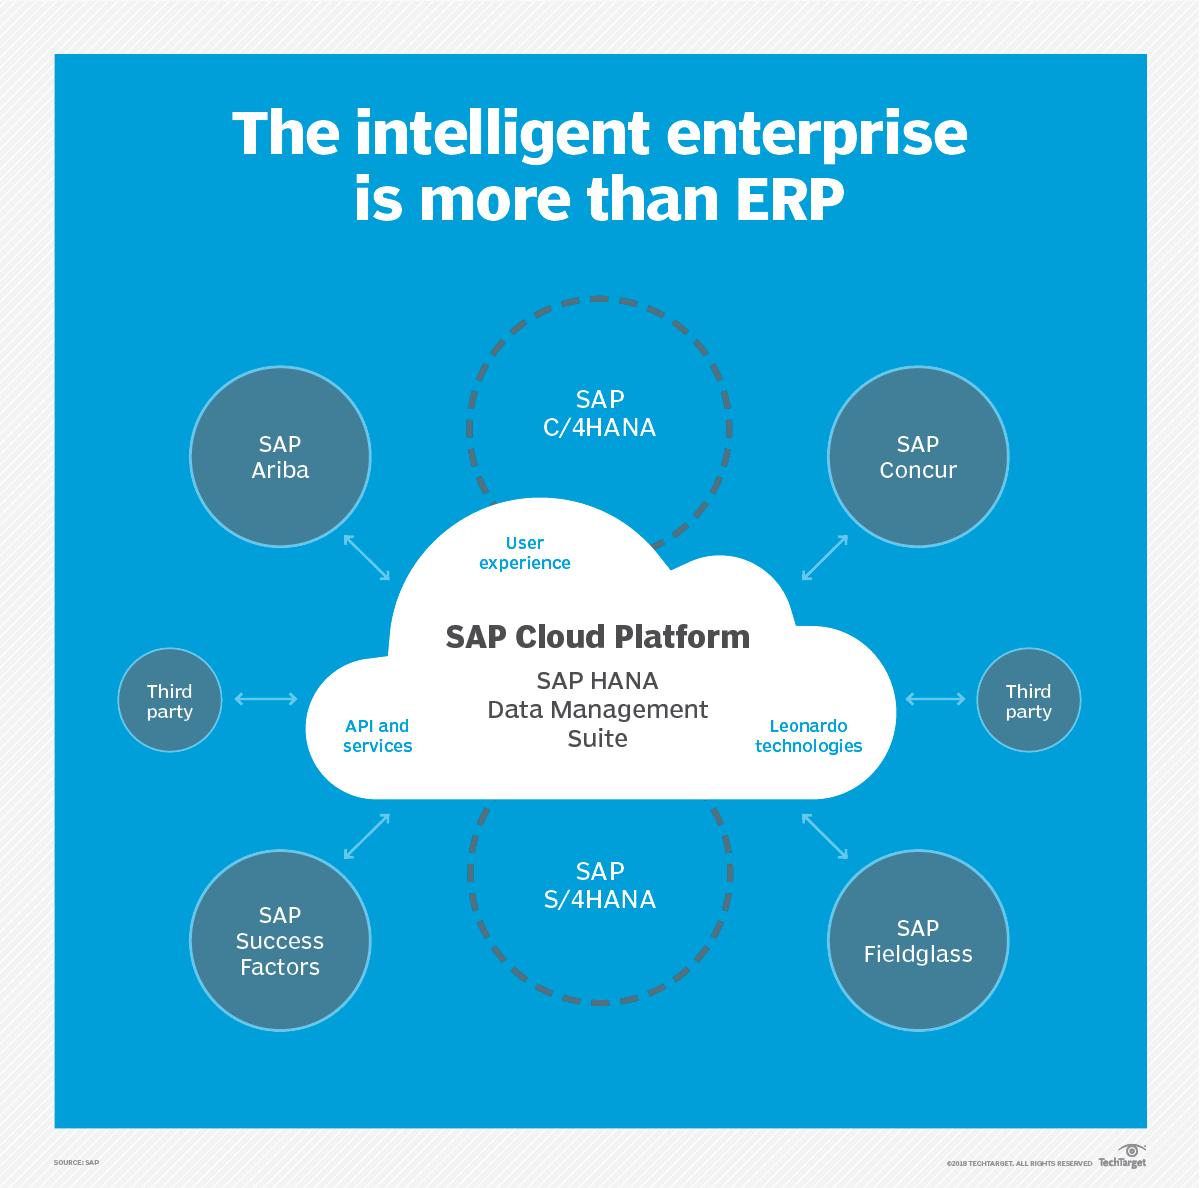 SAP Cloud Platform is the glue for the SAP intelligent